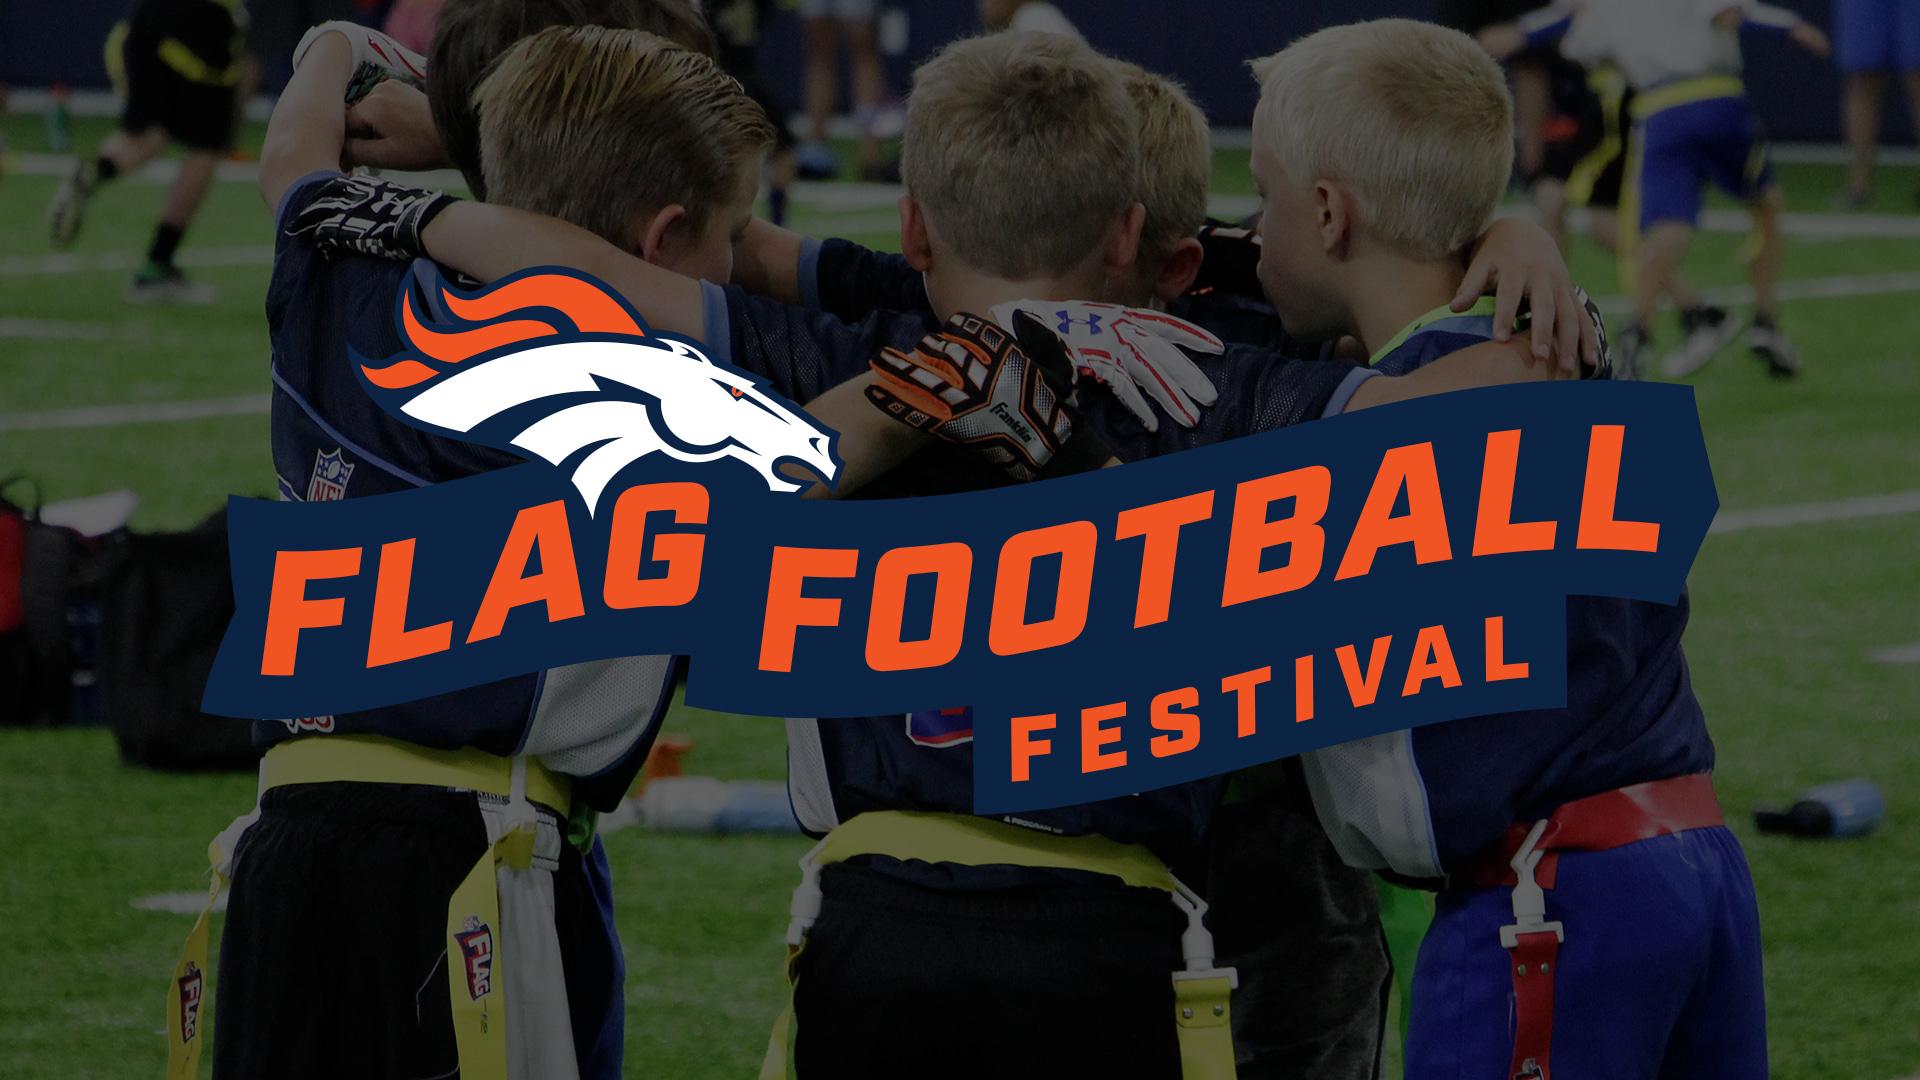 Flag Football Festival